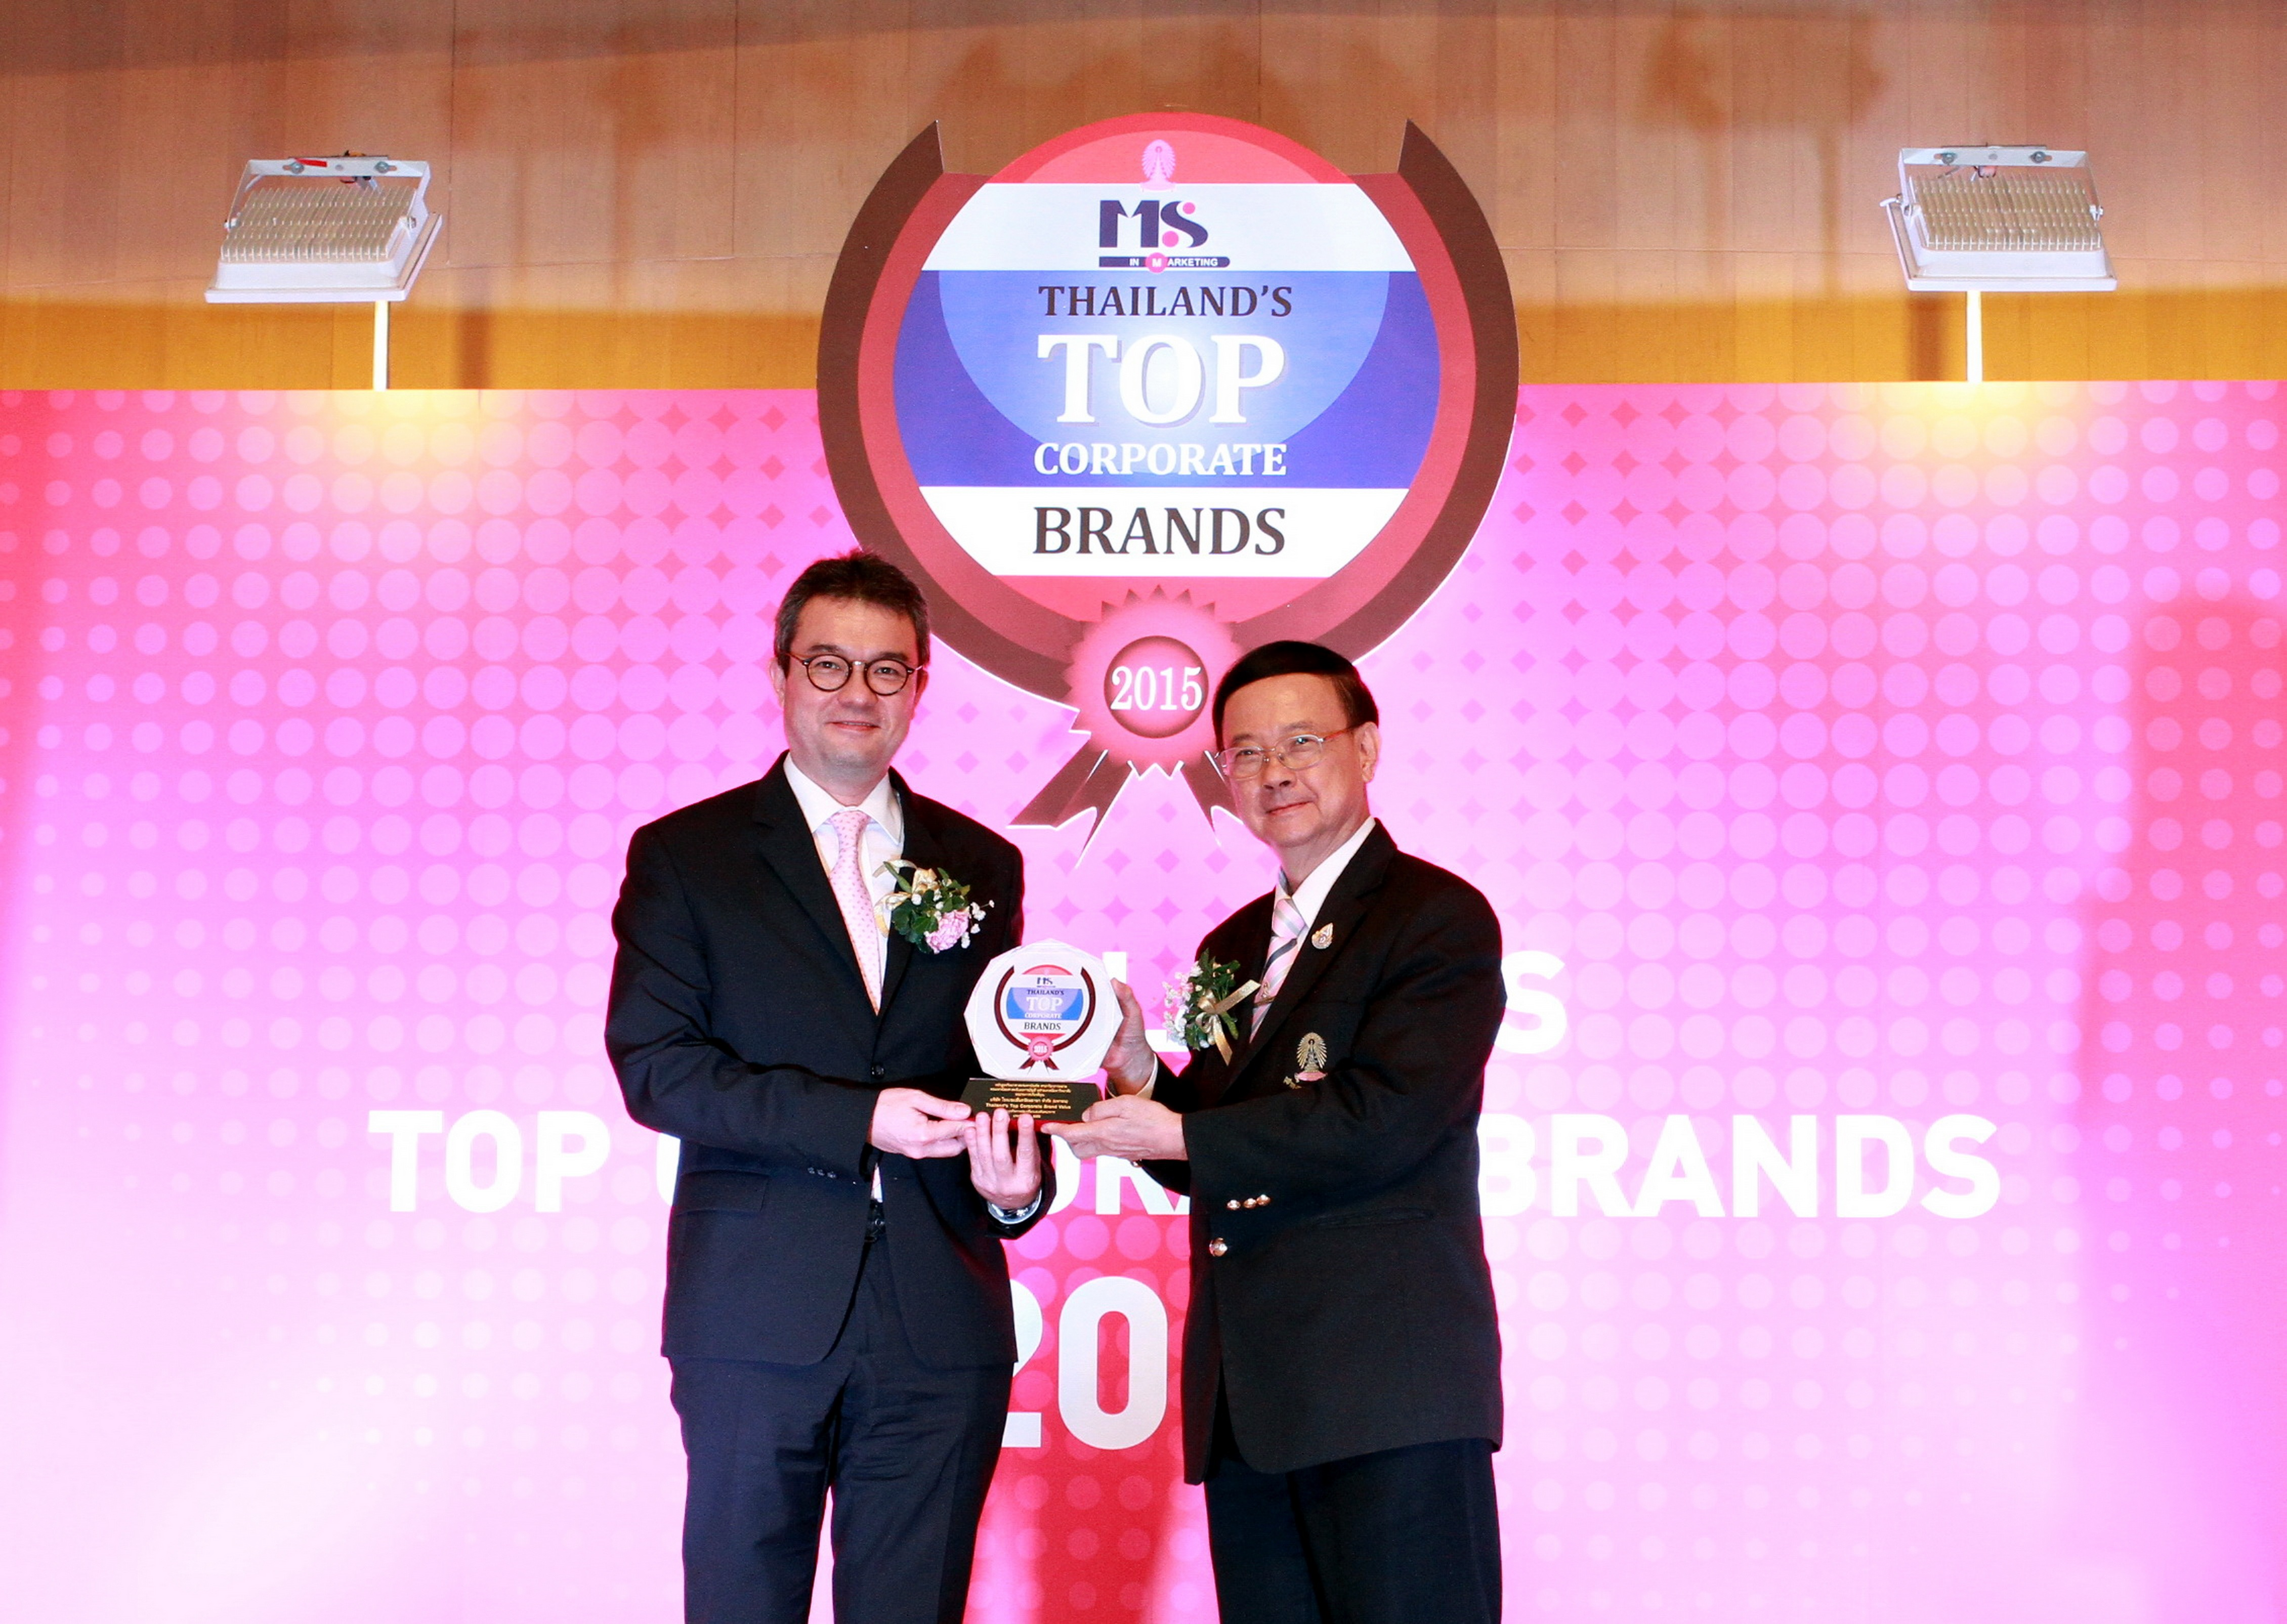 Centara -- Thailand's Top Corporate